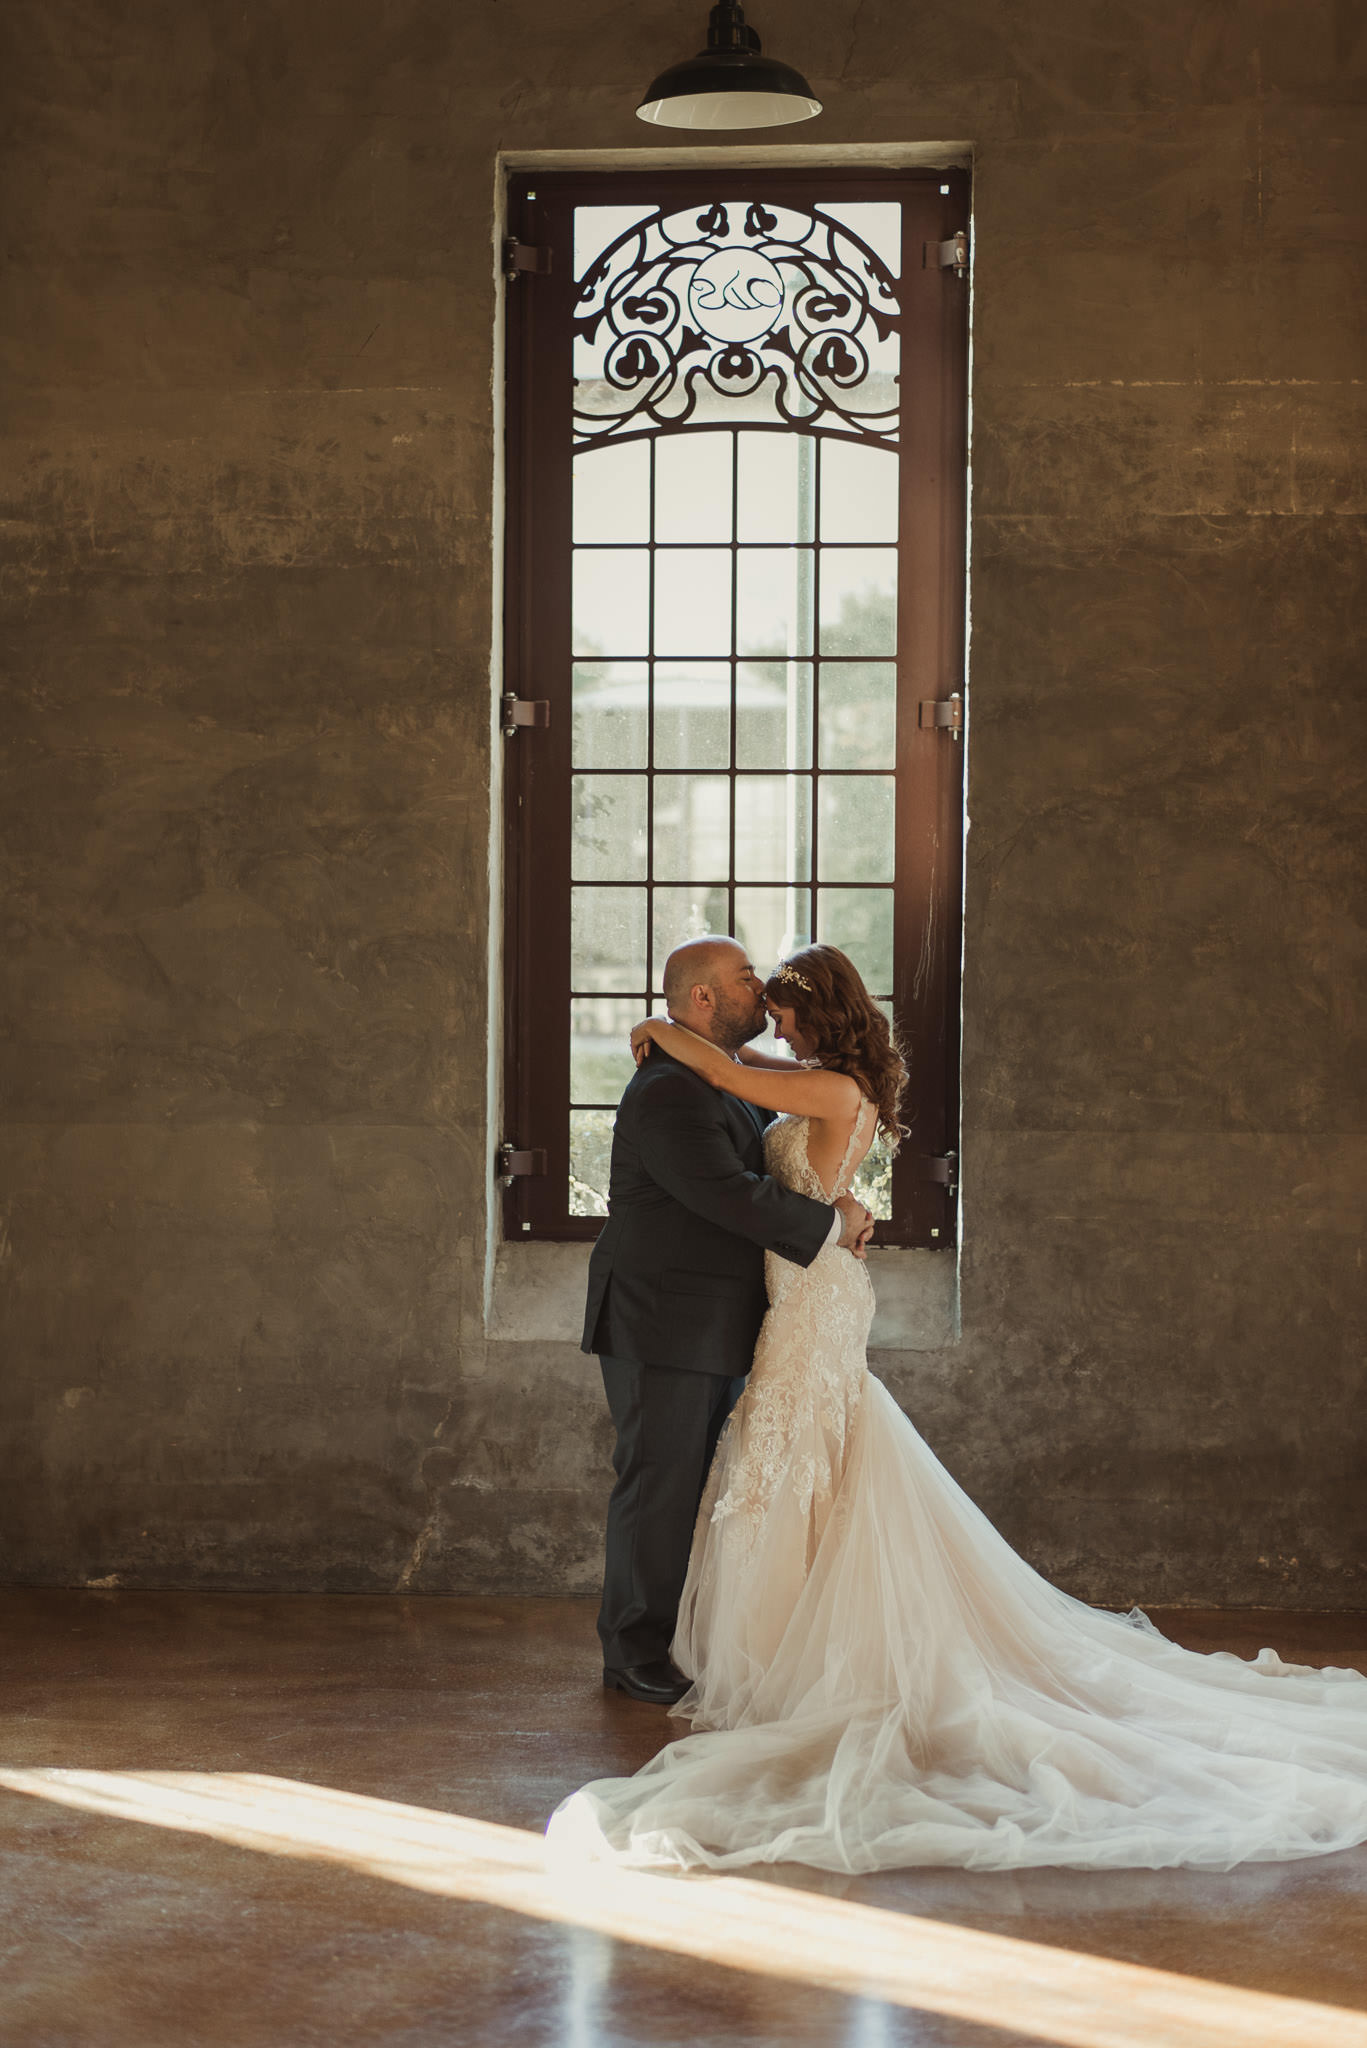 Cynthia-Curtis-Olde-Dobbine-Station-Houston-Wedding-Photographer-sm-52.jpg